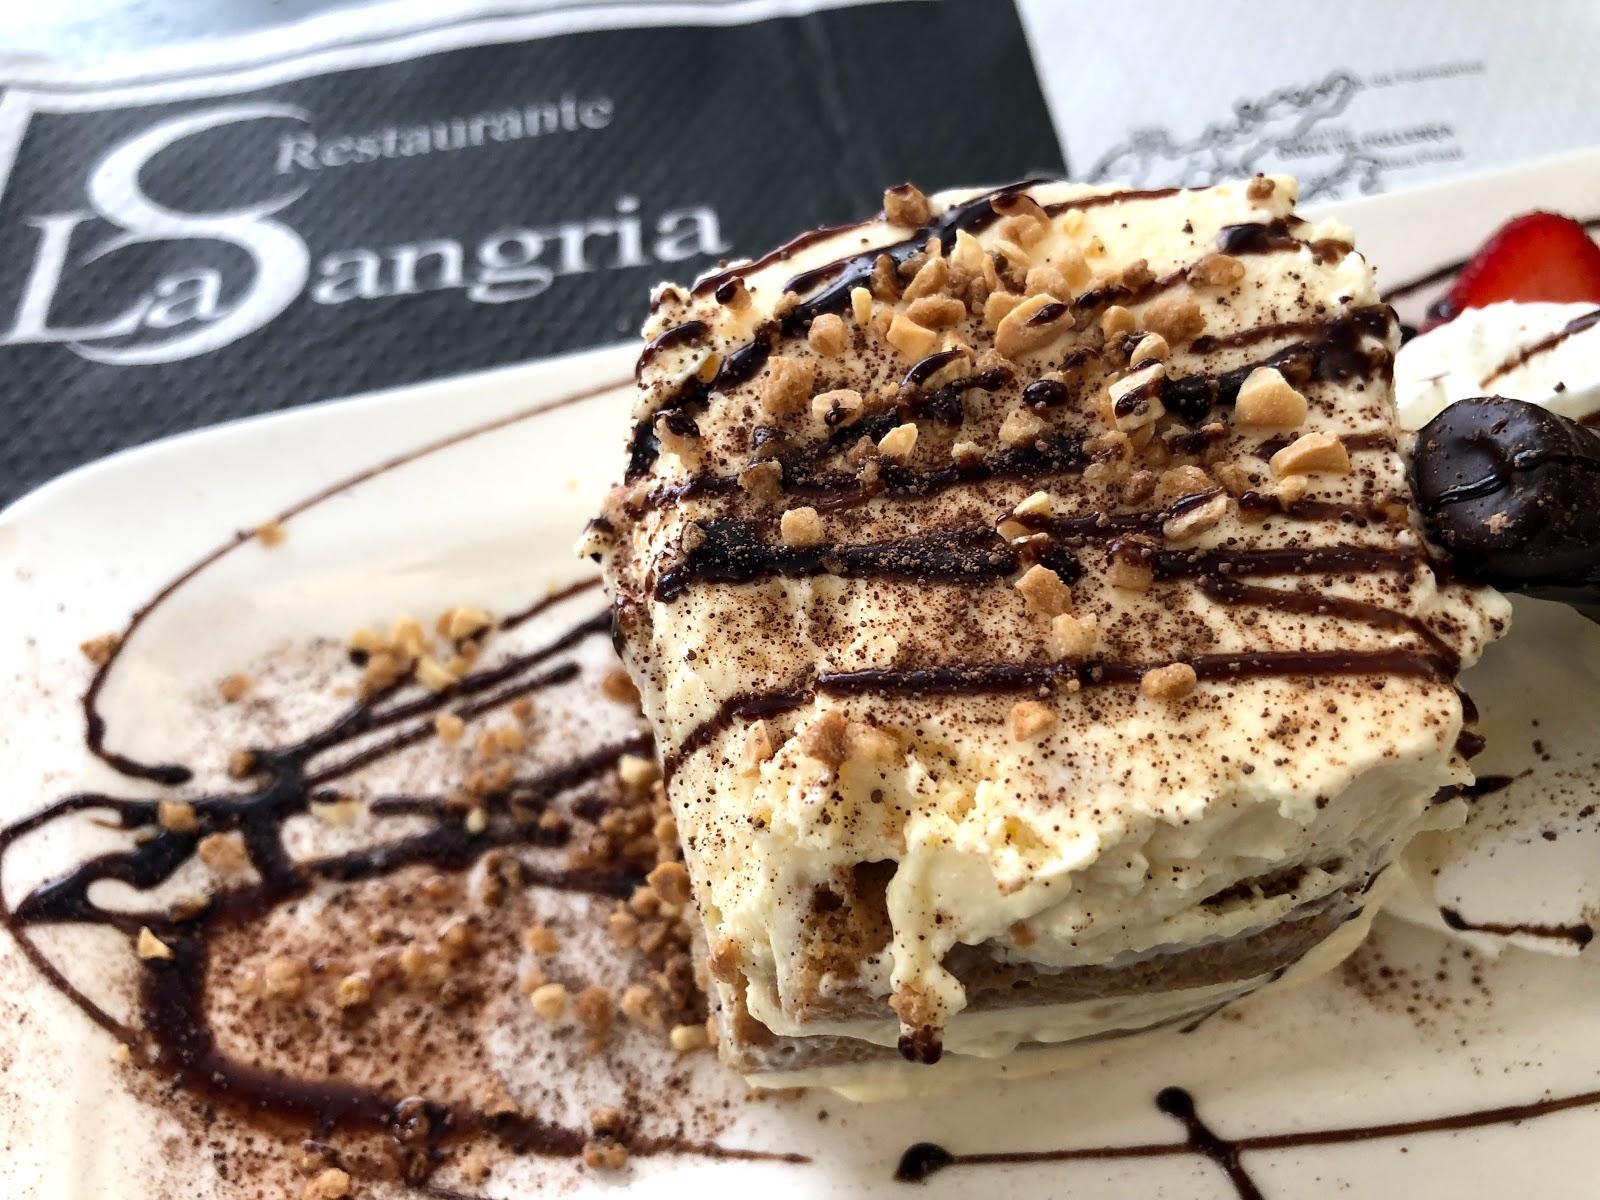 Restaurante La Sangria